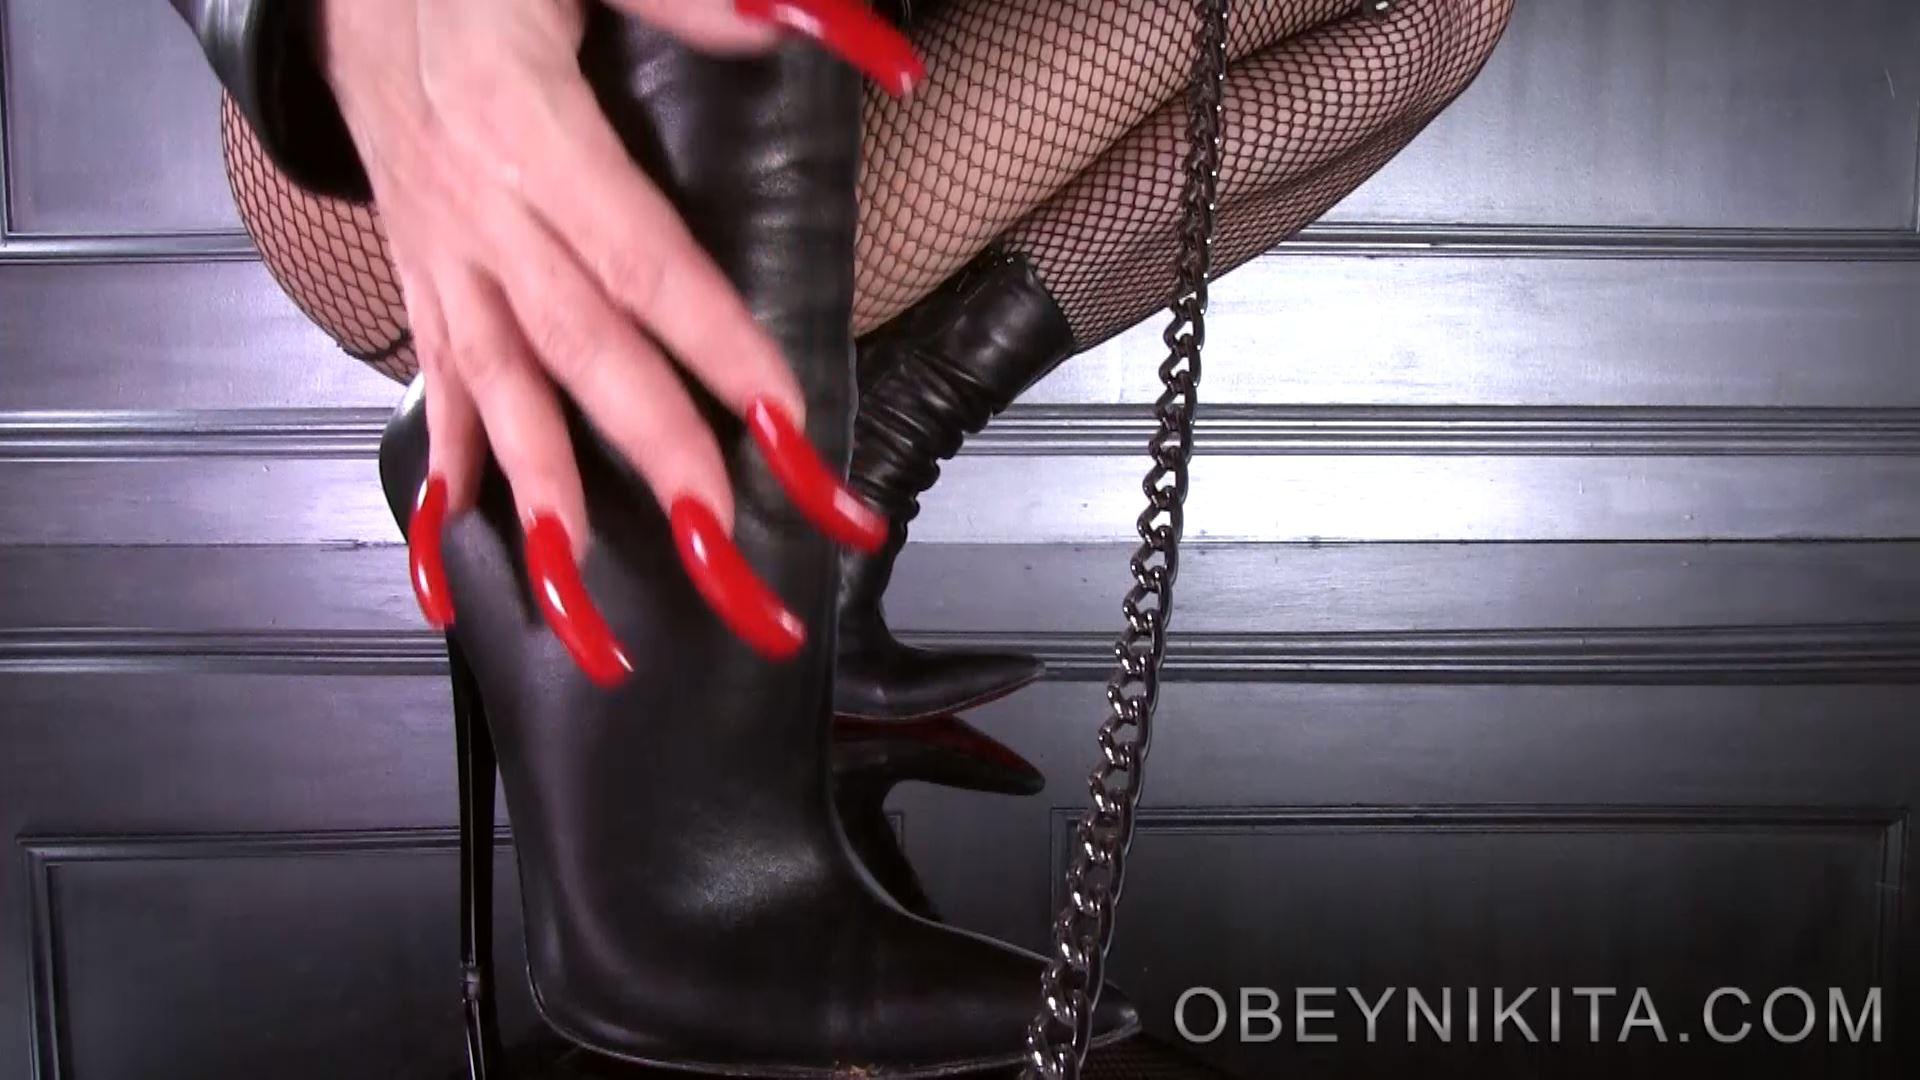 Mistress Nikita In Scene: Shoe Slave Pov Six Inch Boots - OBEYNIKITA - FULL HD/1080p/MP4